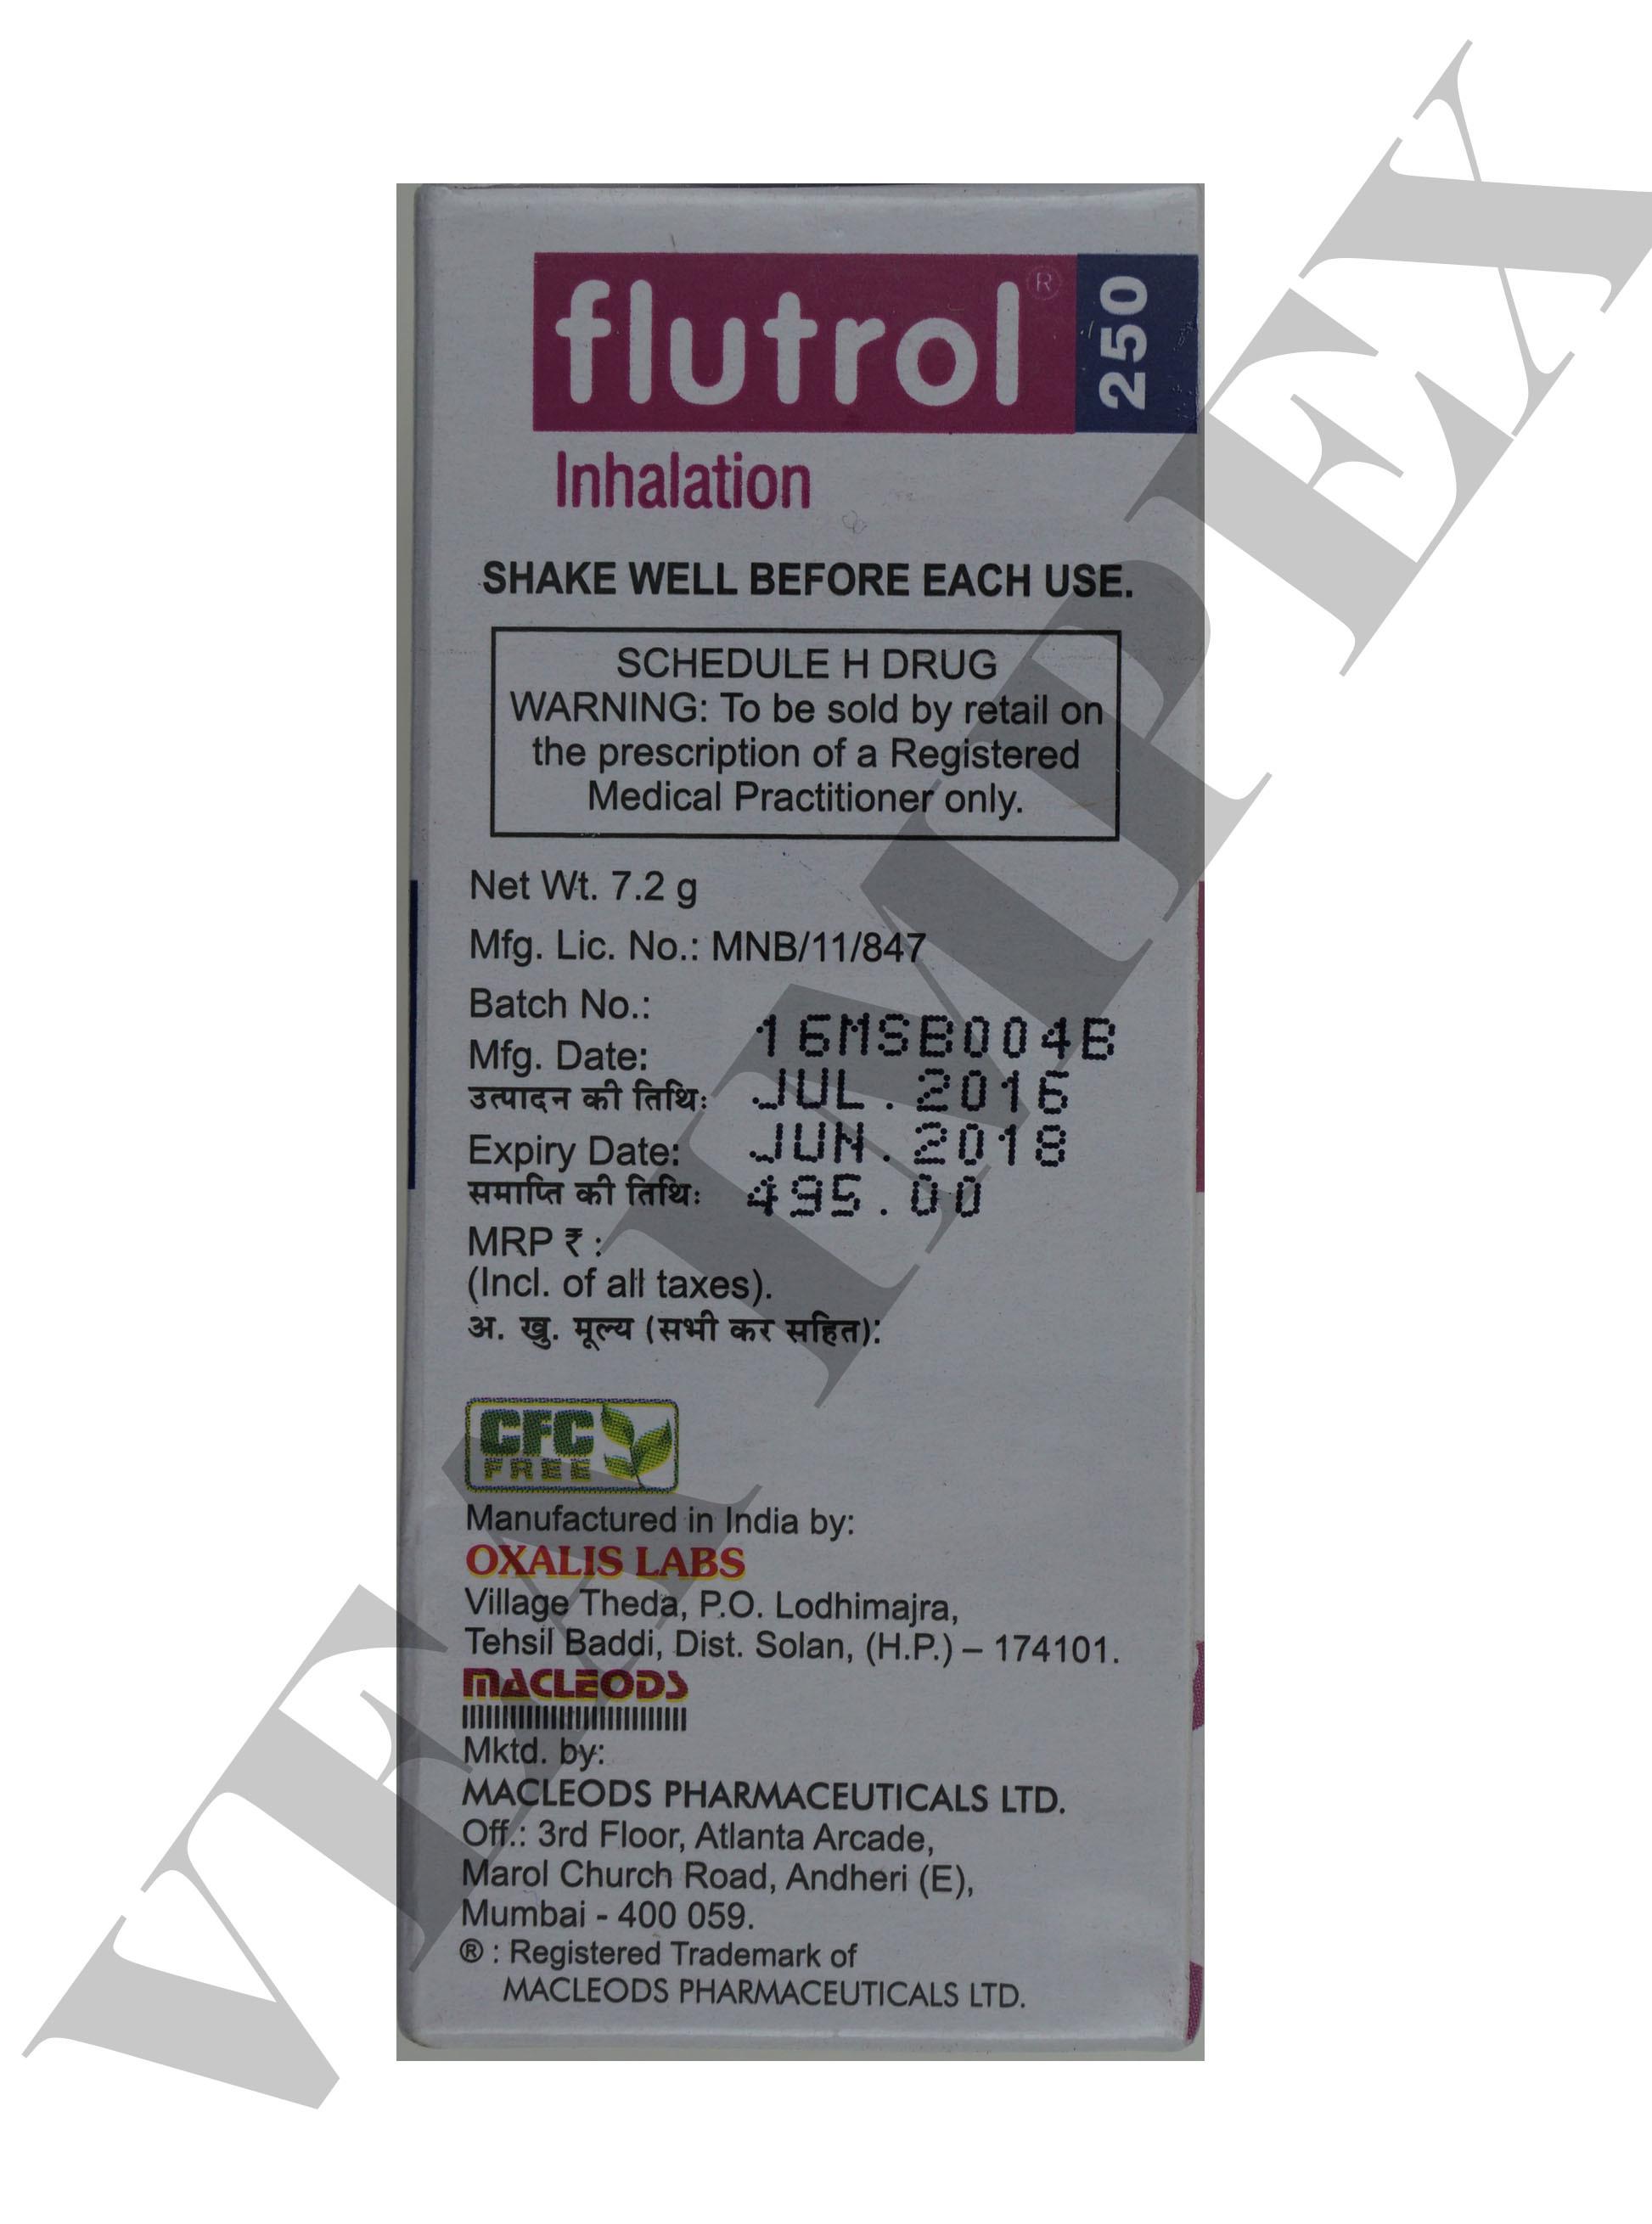 Flutrol 250 mg inhalation